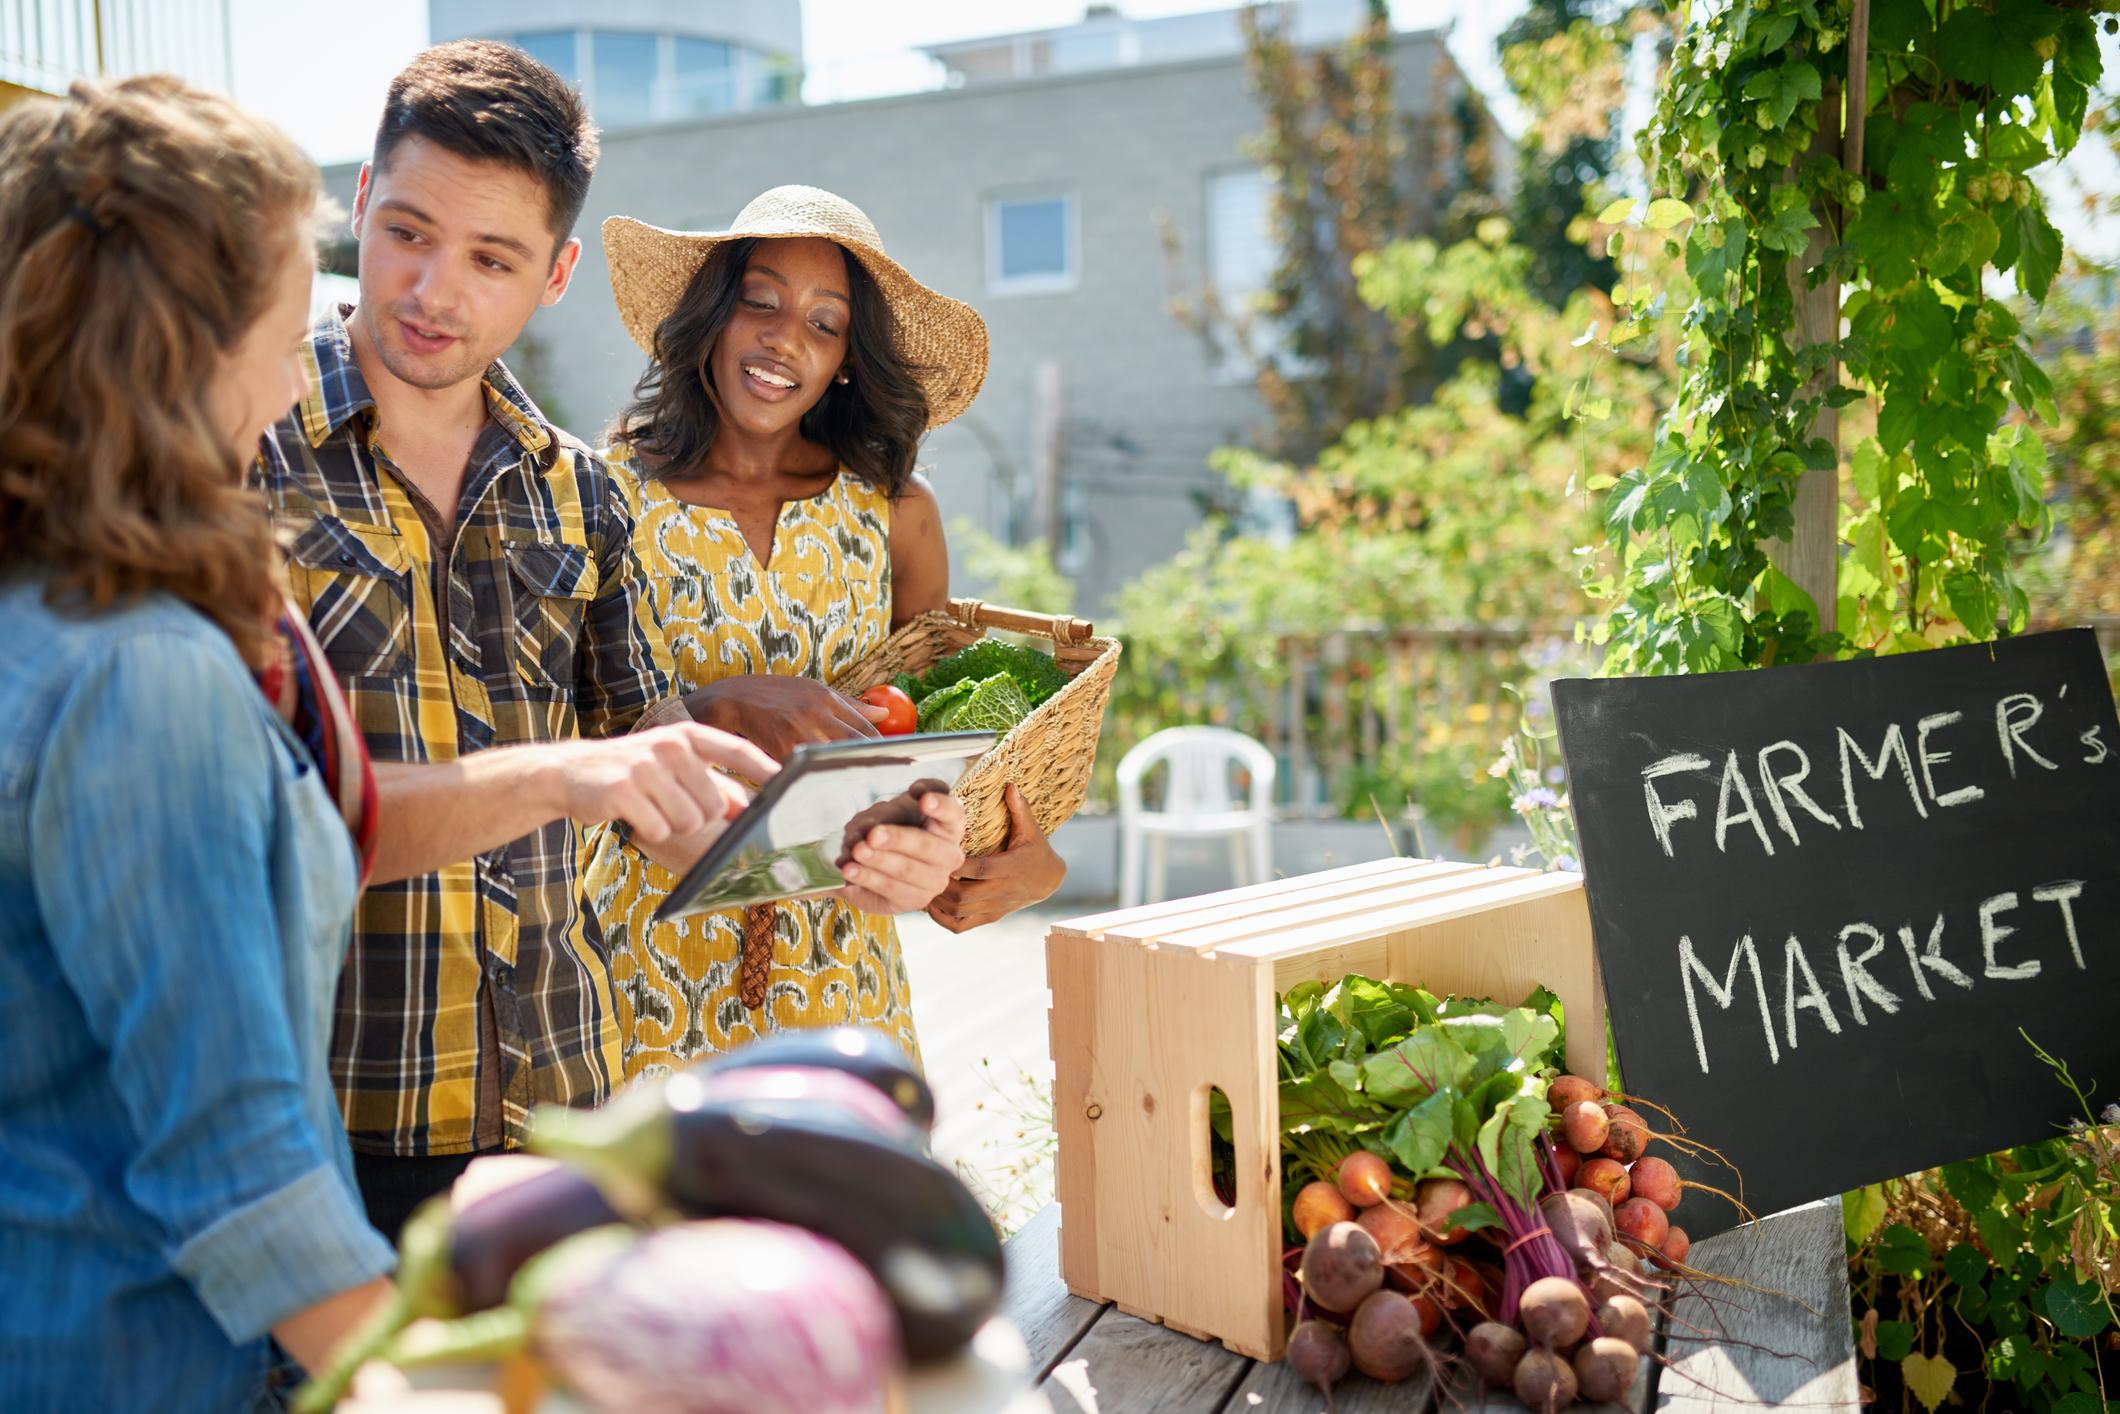 produce in season